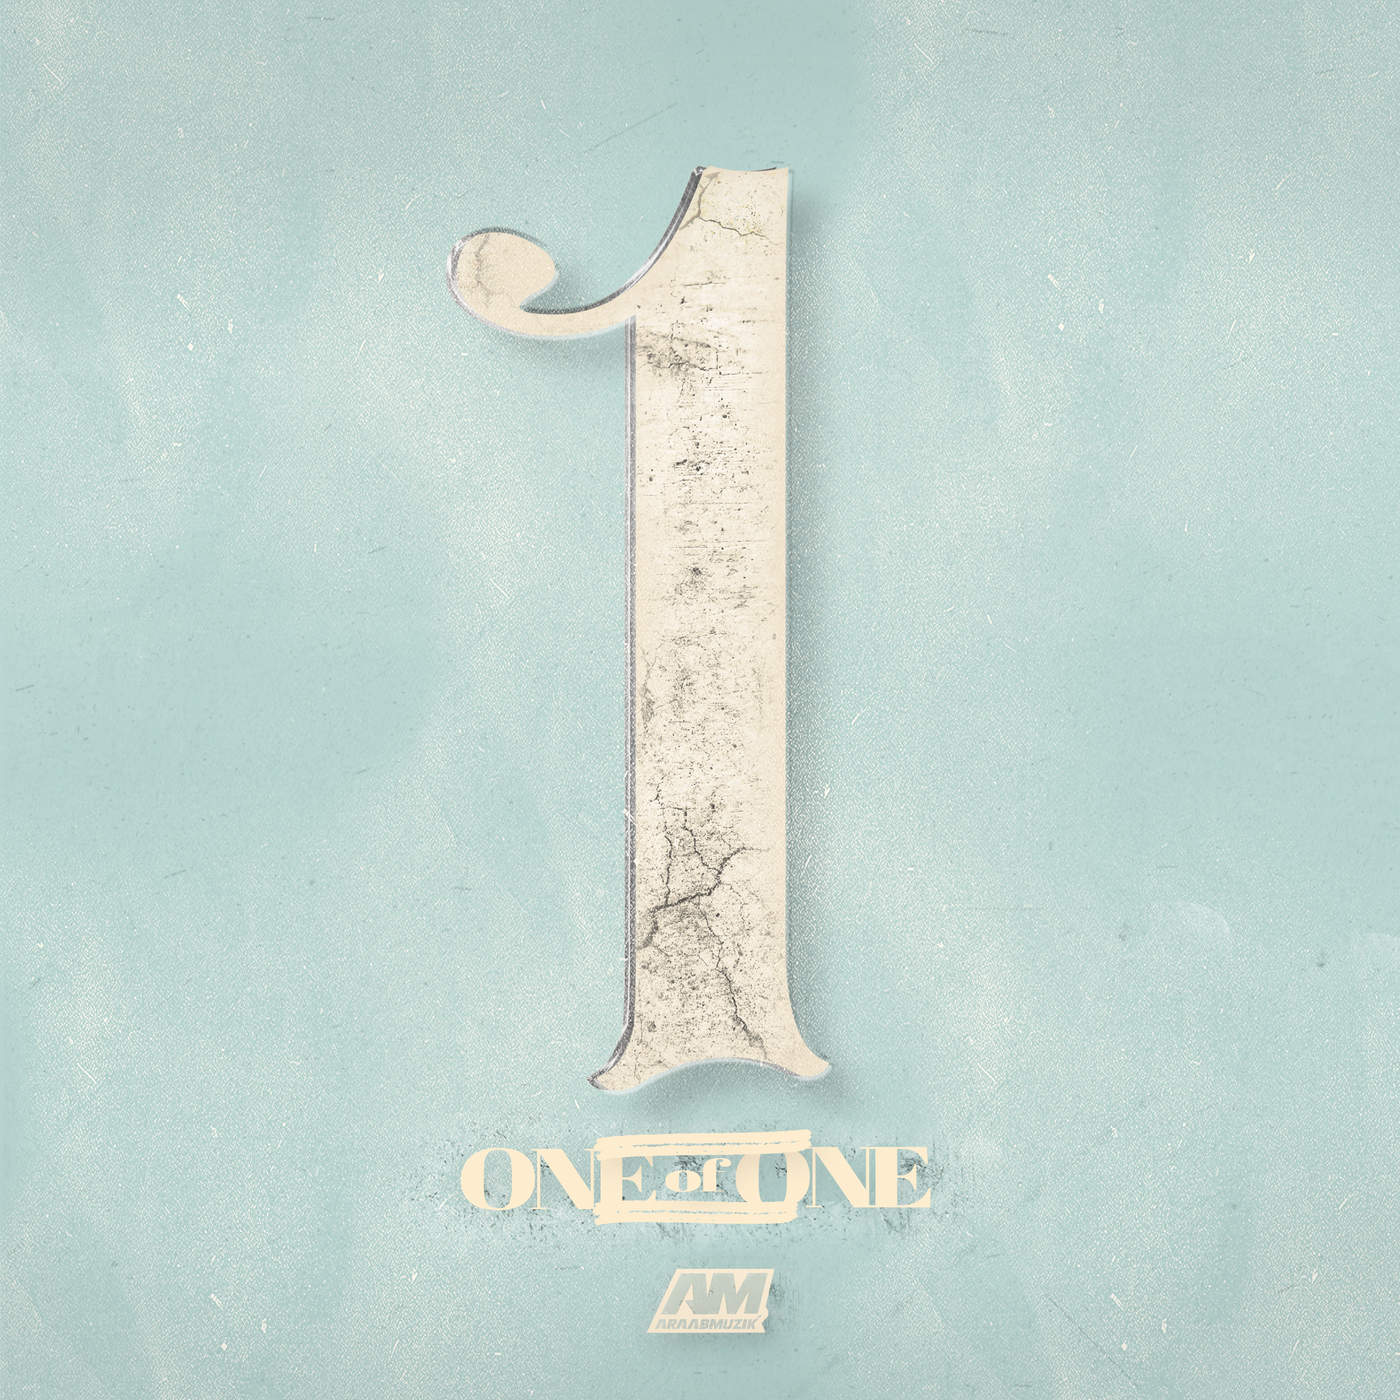 Araabmuzik - One of One - EP Cover